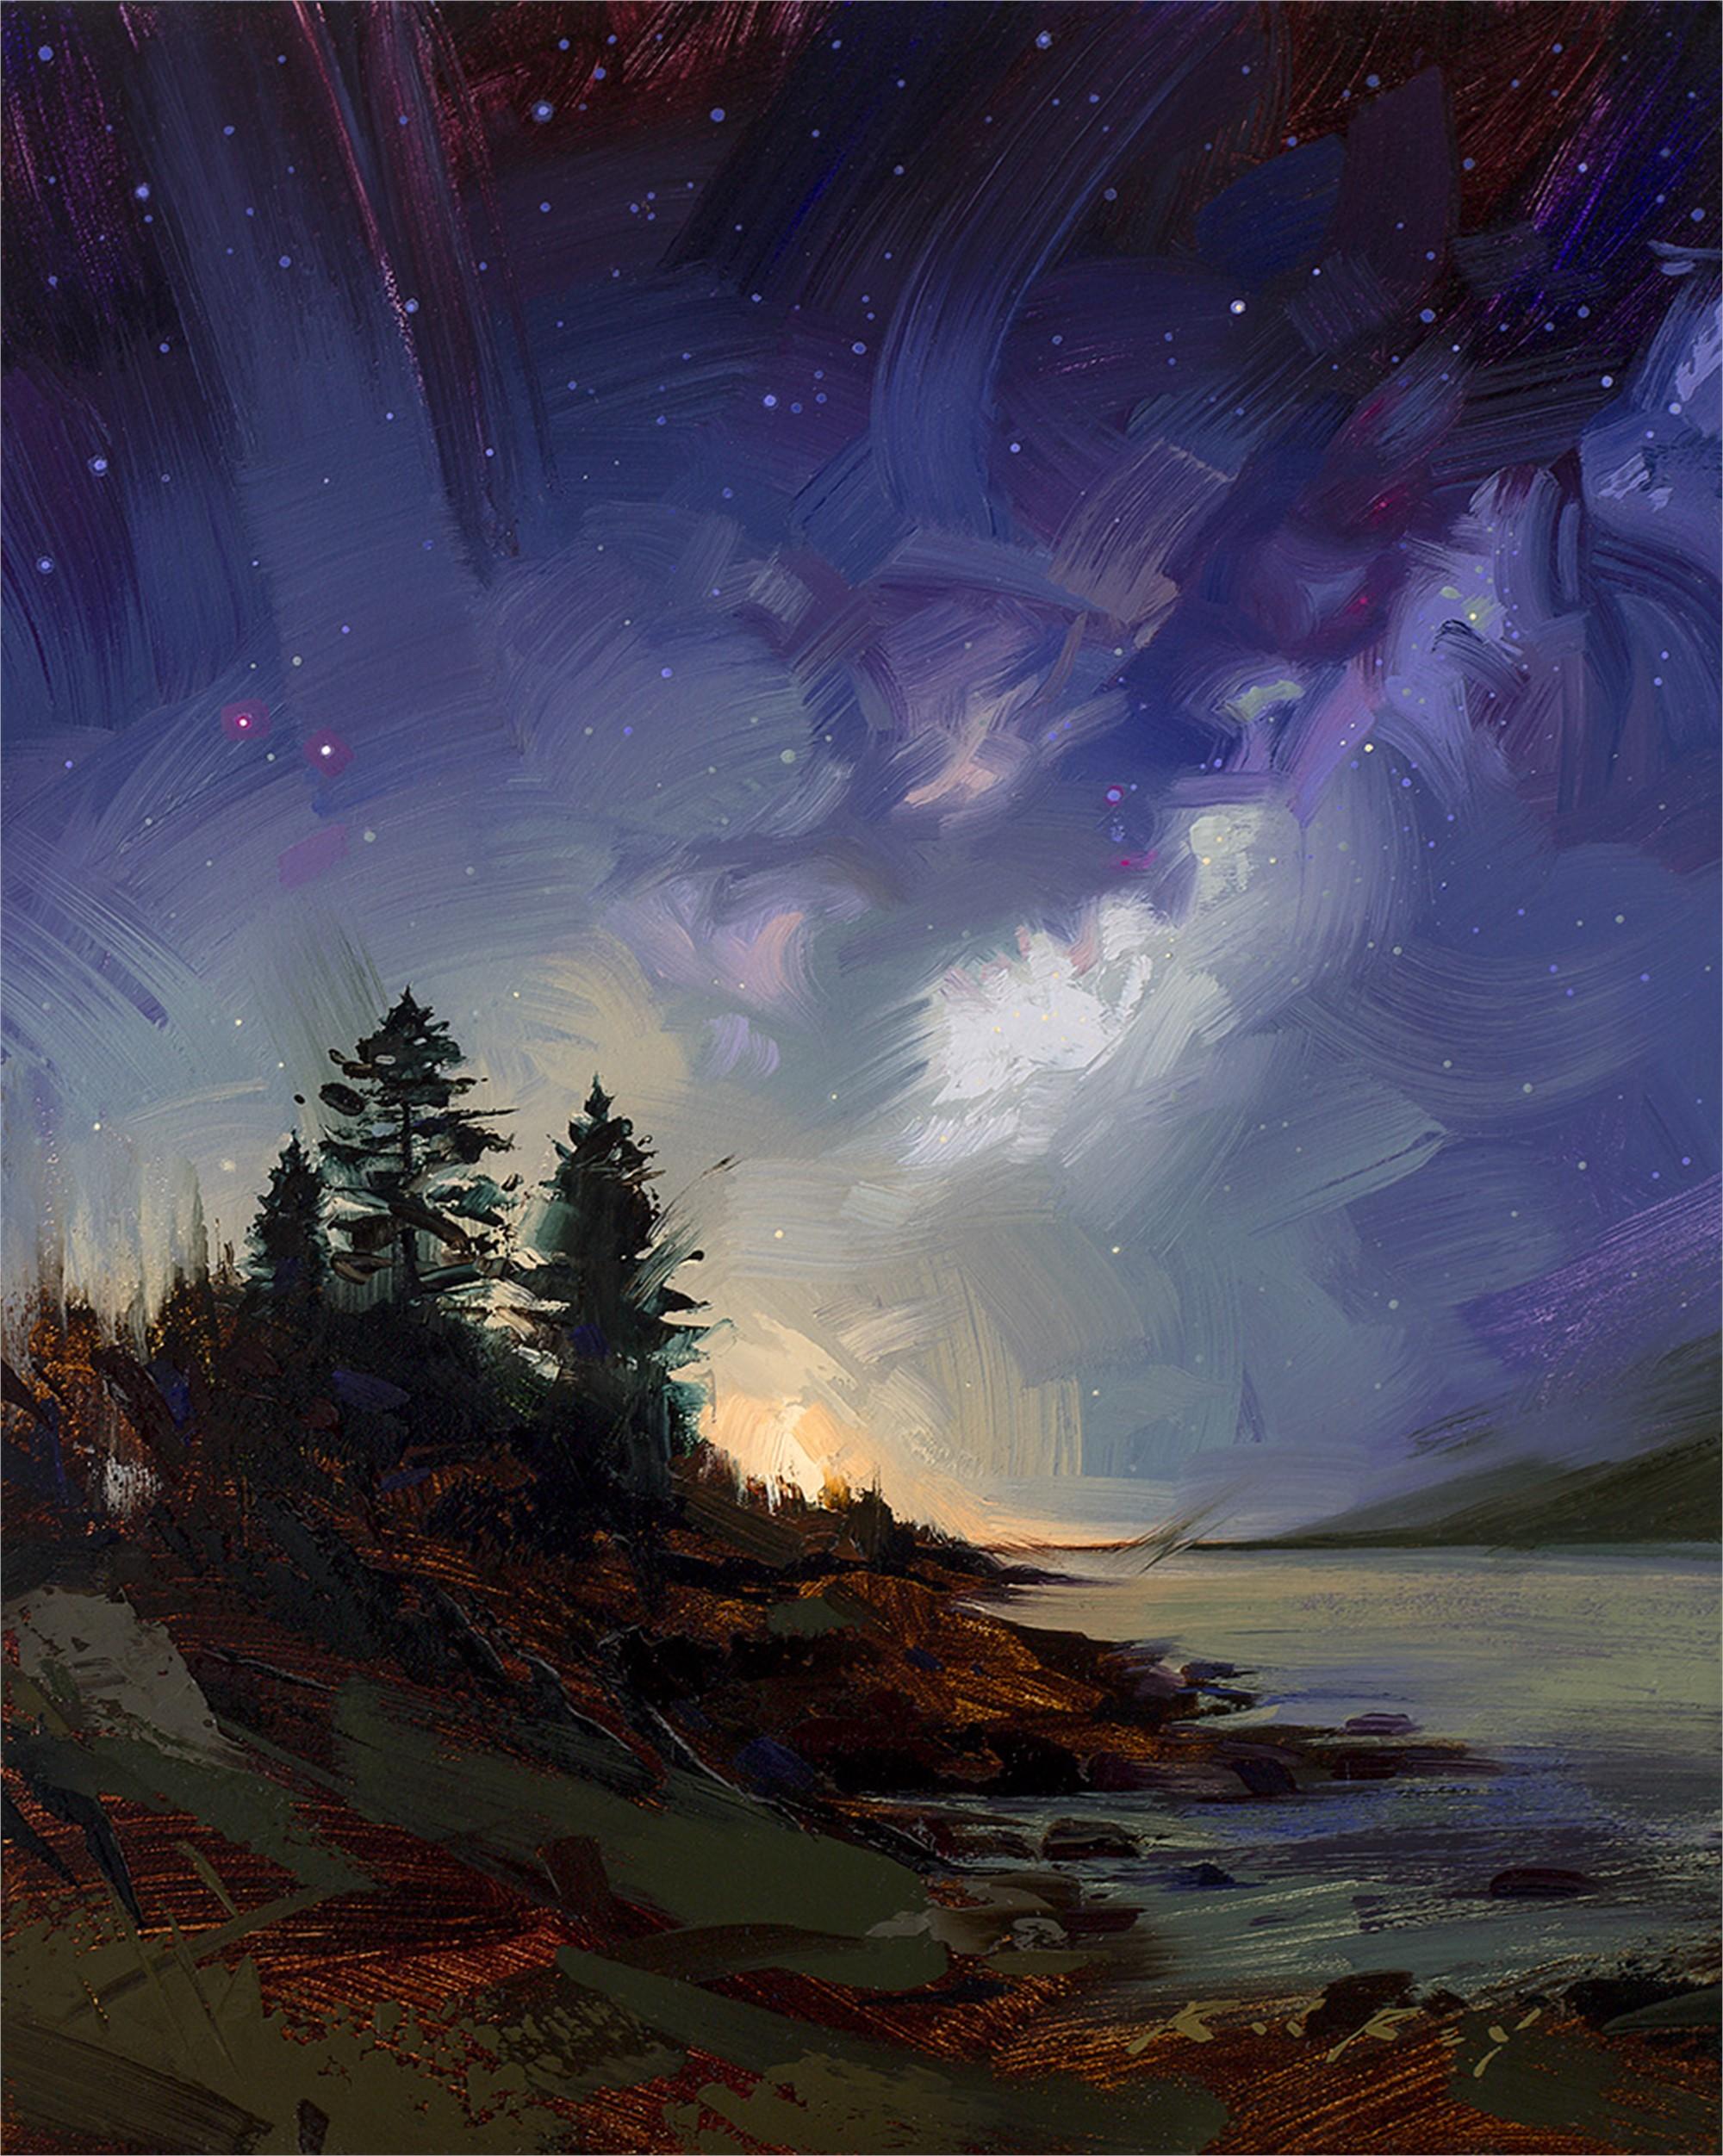 Starswept by Rob Rey